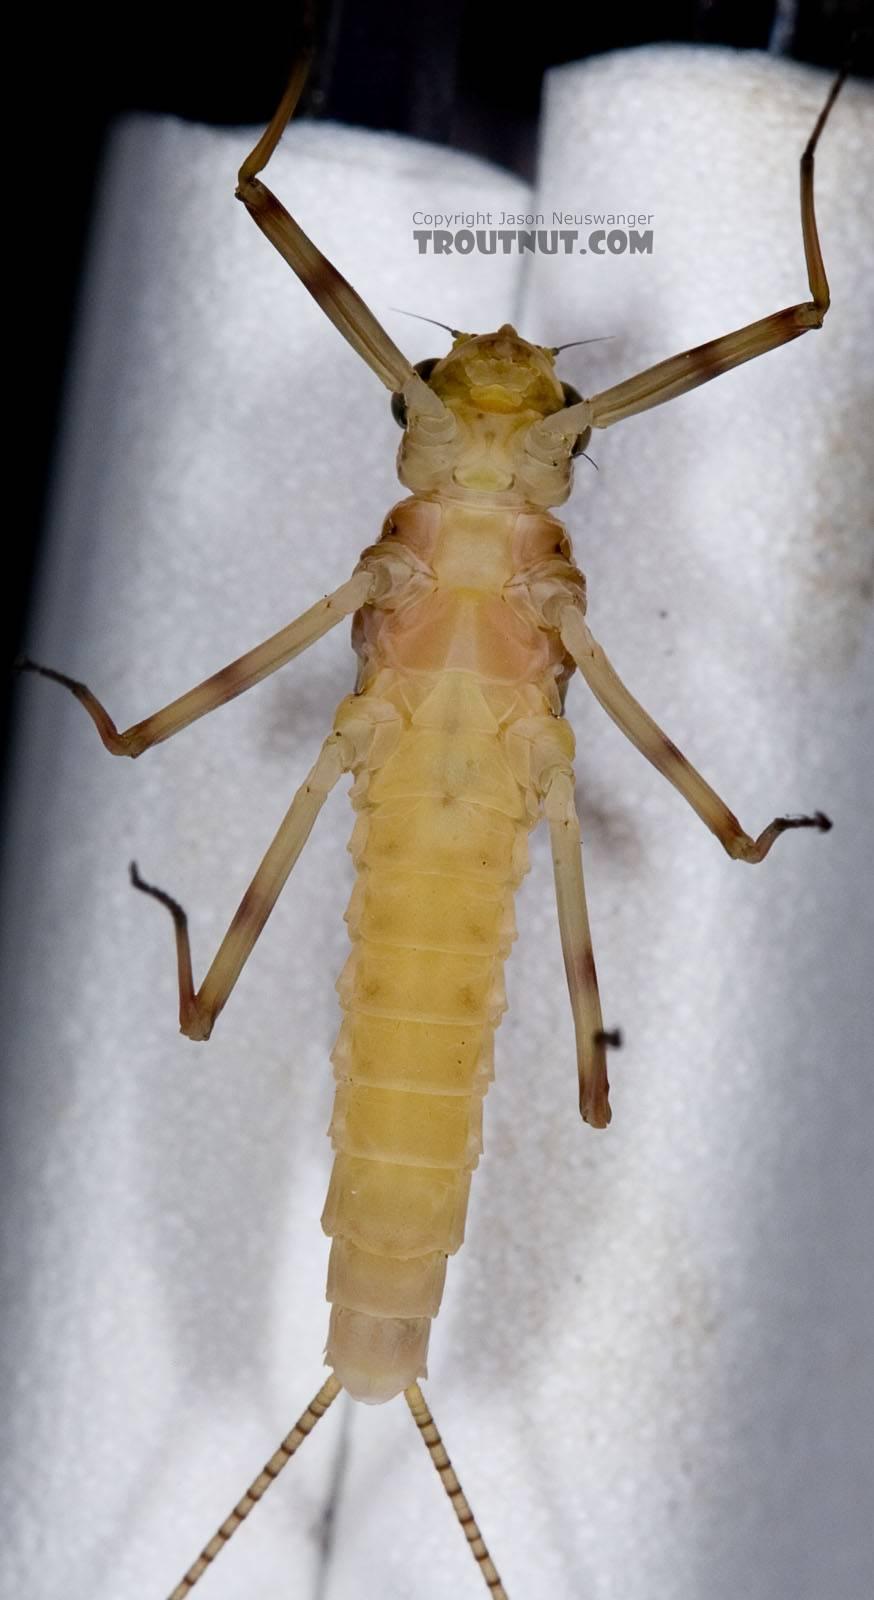 Female Maccaffertium ithaca (Light Cahill) Mayfly Dun from the Little Juniata River in Pennsylvania